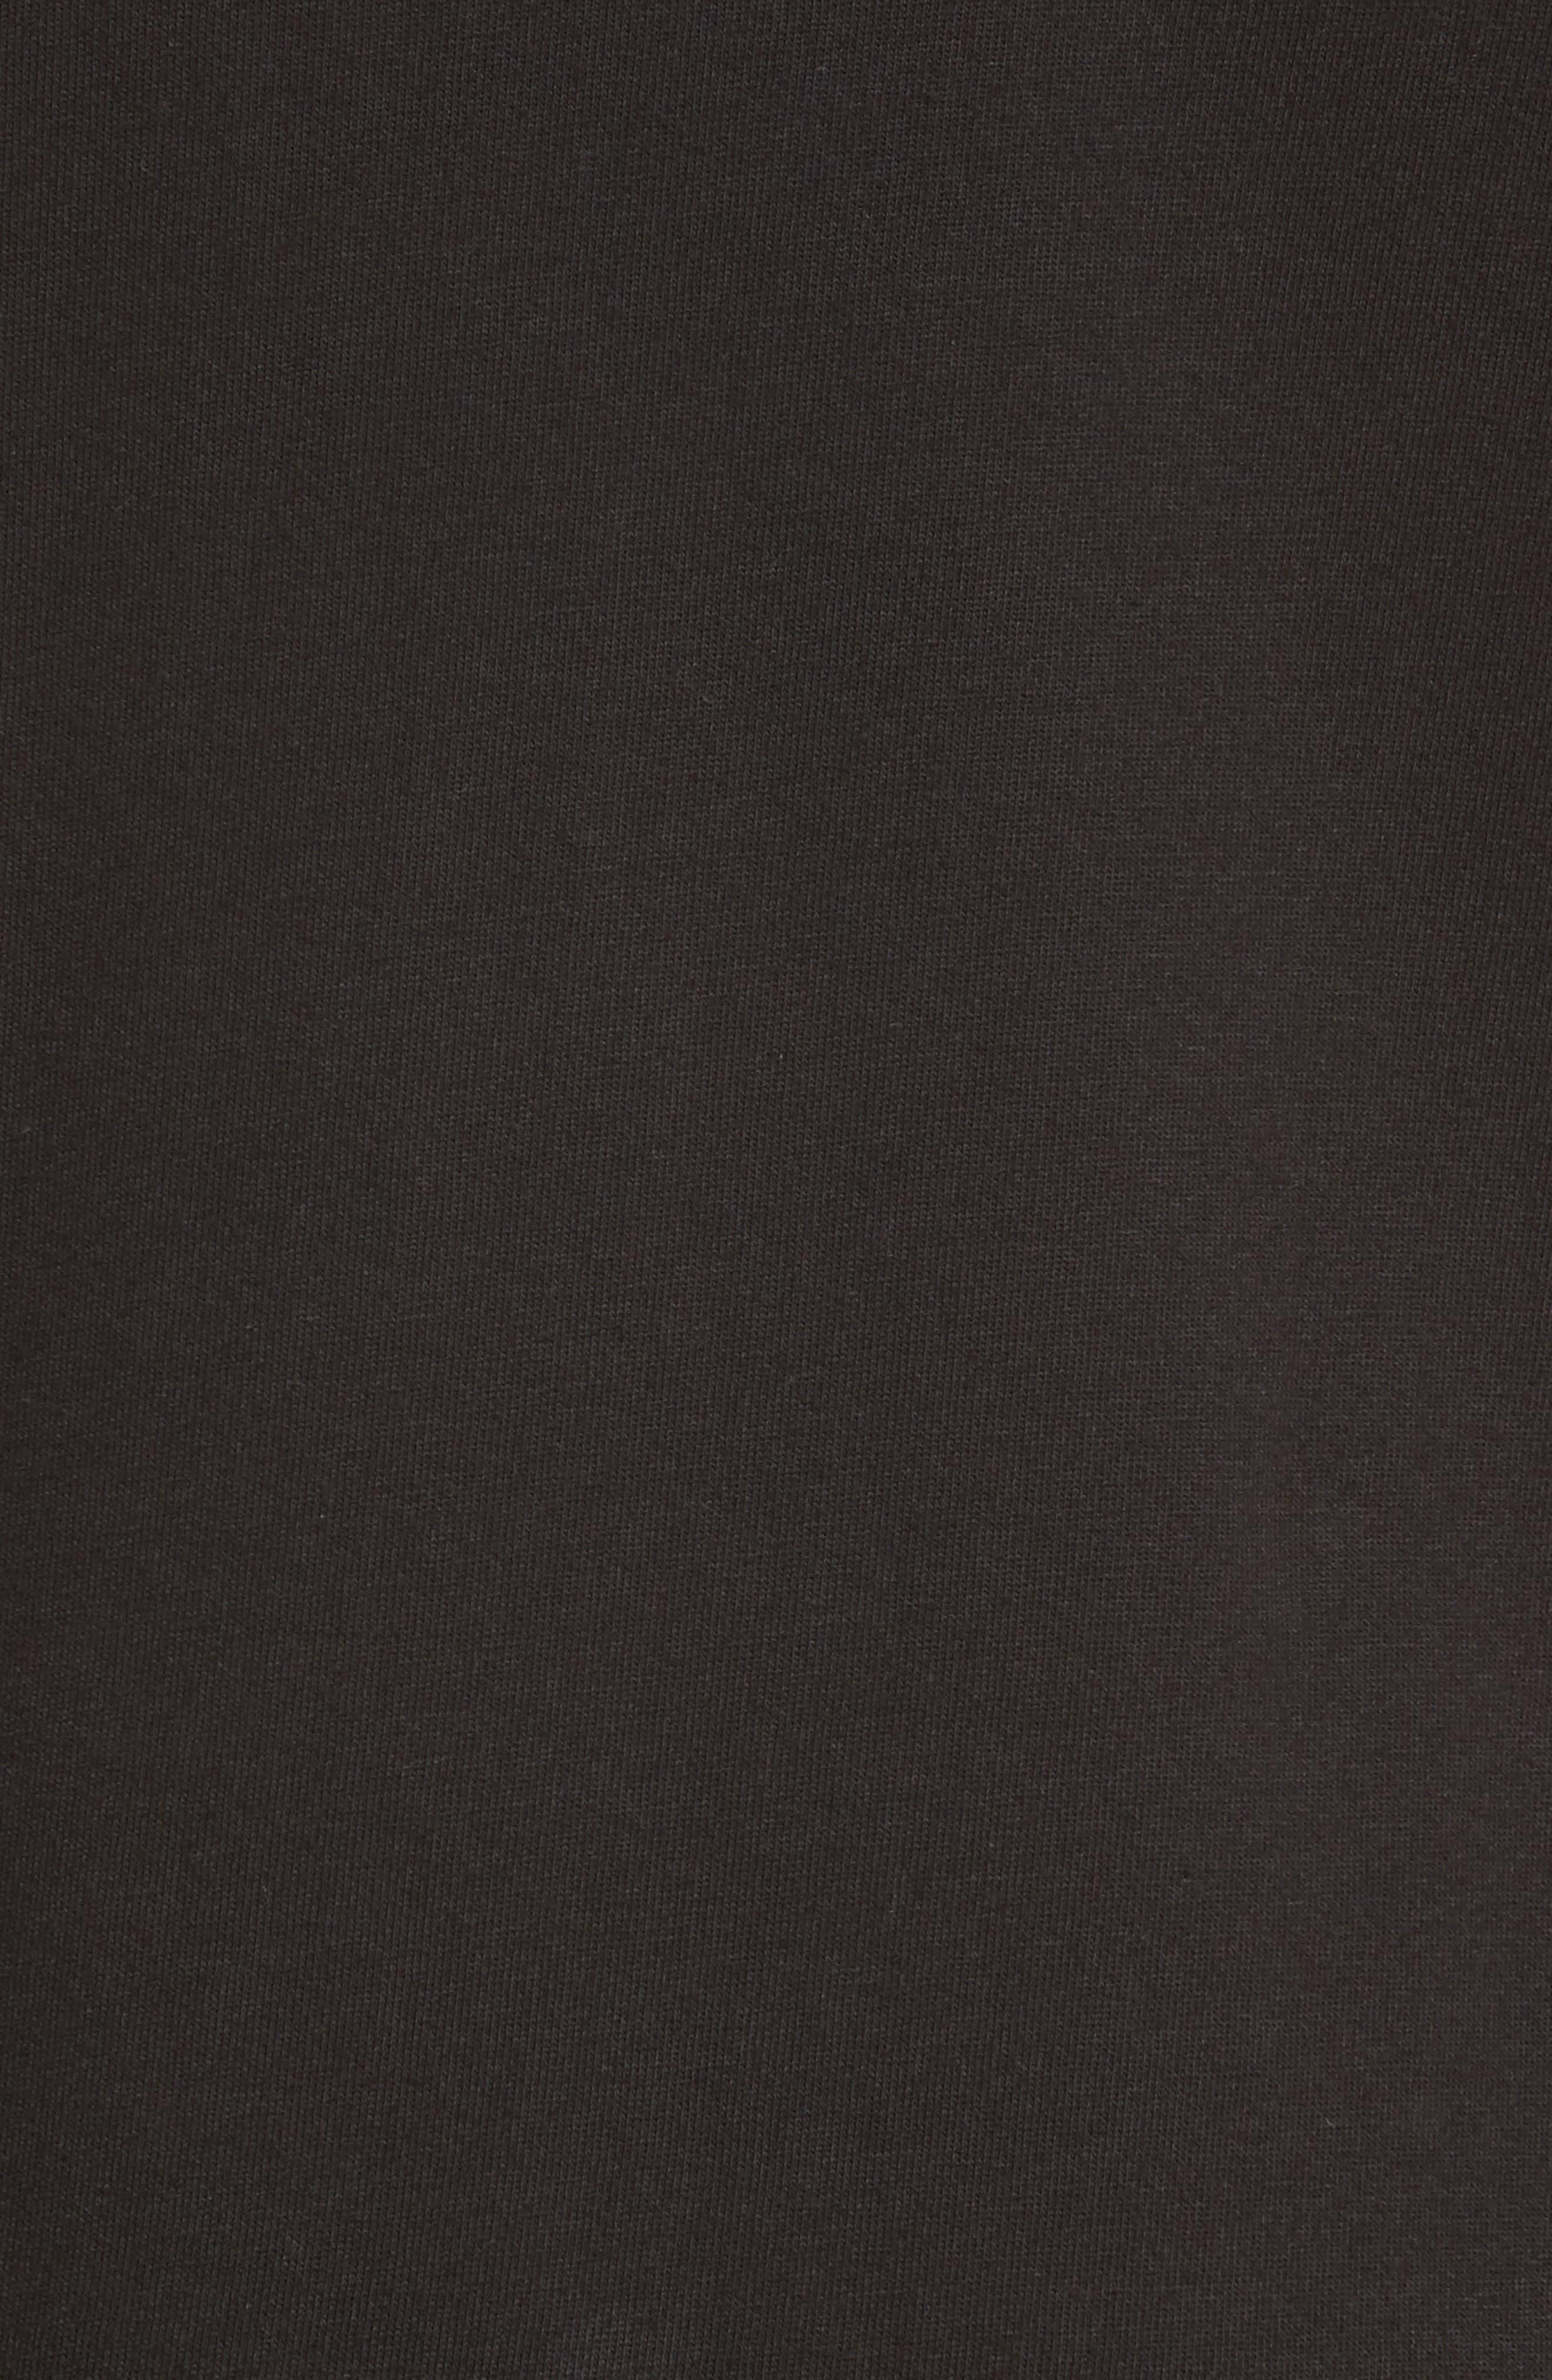 Alternate Image 5  - Proenza Schouler PSWL Embroidered Jersey Turtleneck